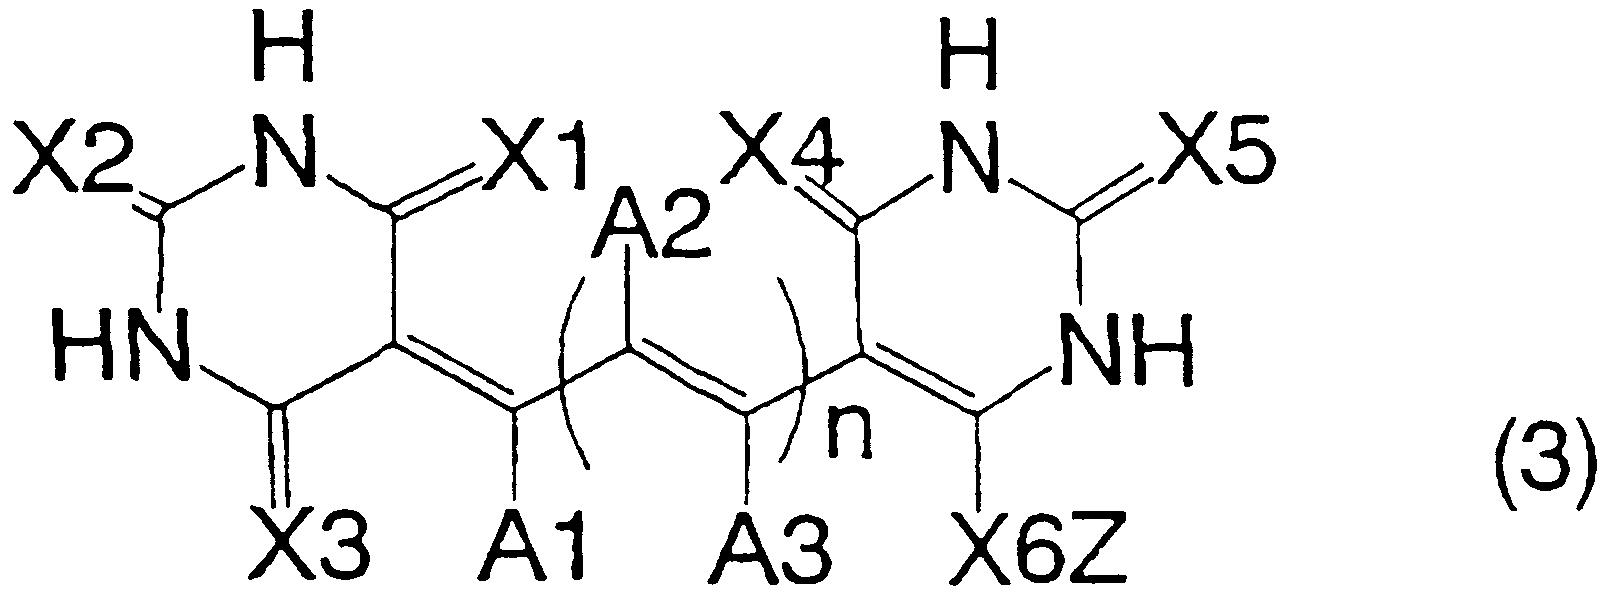 Figure 112003032953391-pct00003